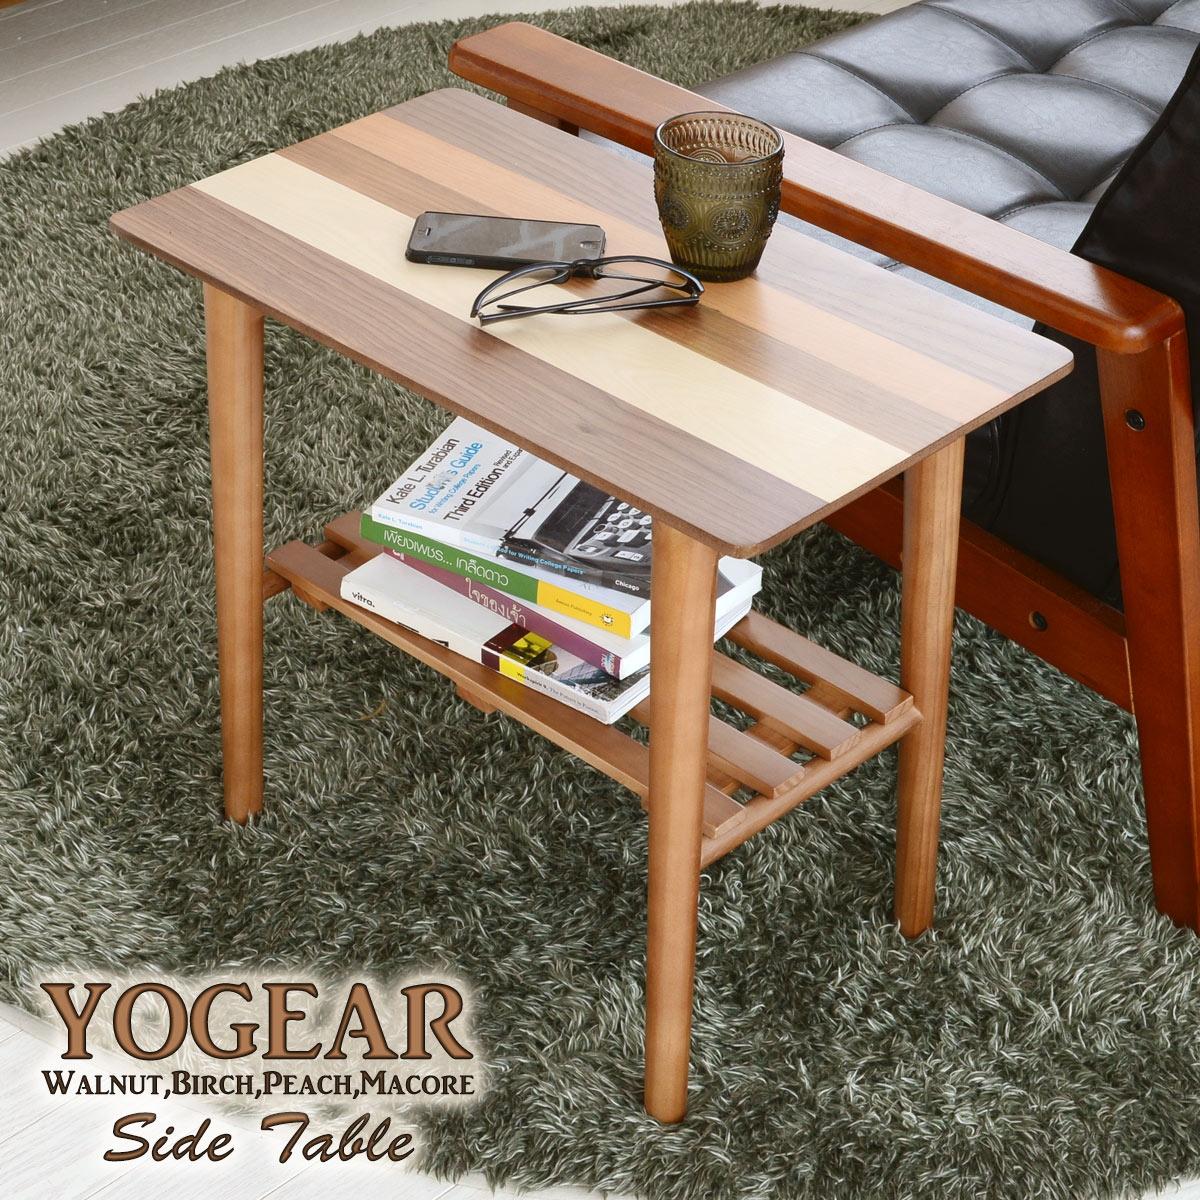 YOGEARサイドテーブル W550×D325×H500mm 【送料無料】 木製 ウッド お洒落 オシャレ 家具 インテリア ヨギア YOST-550